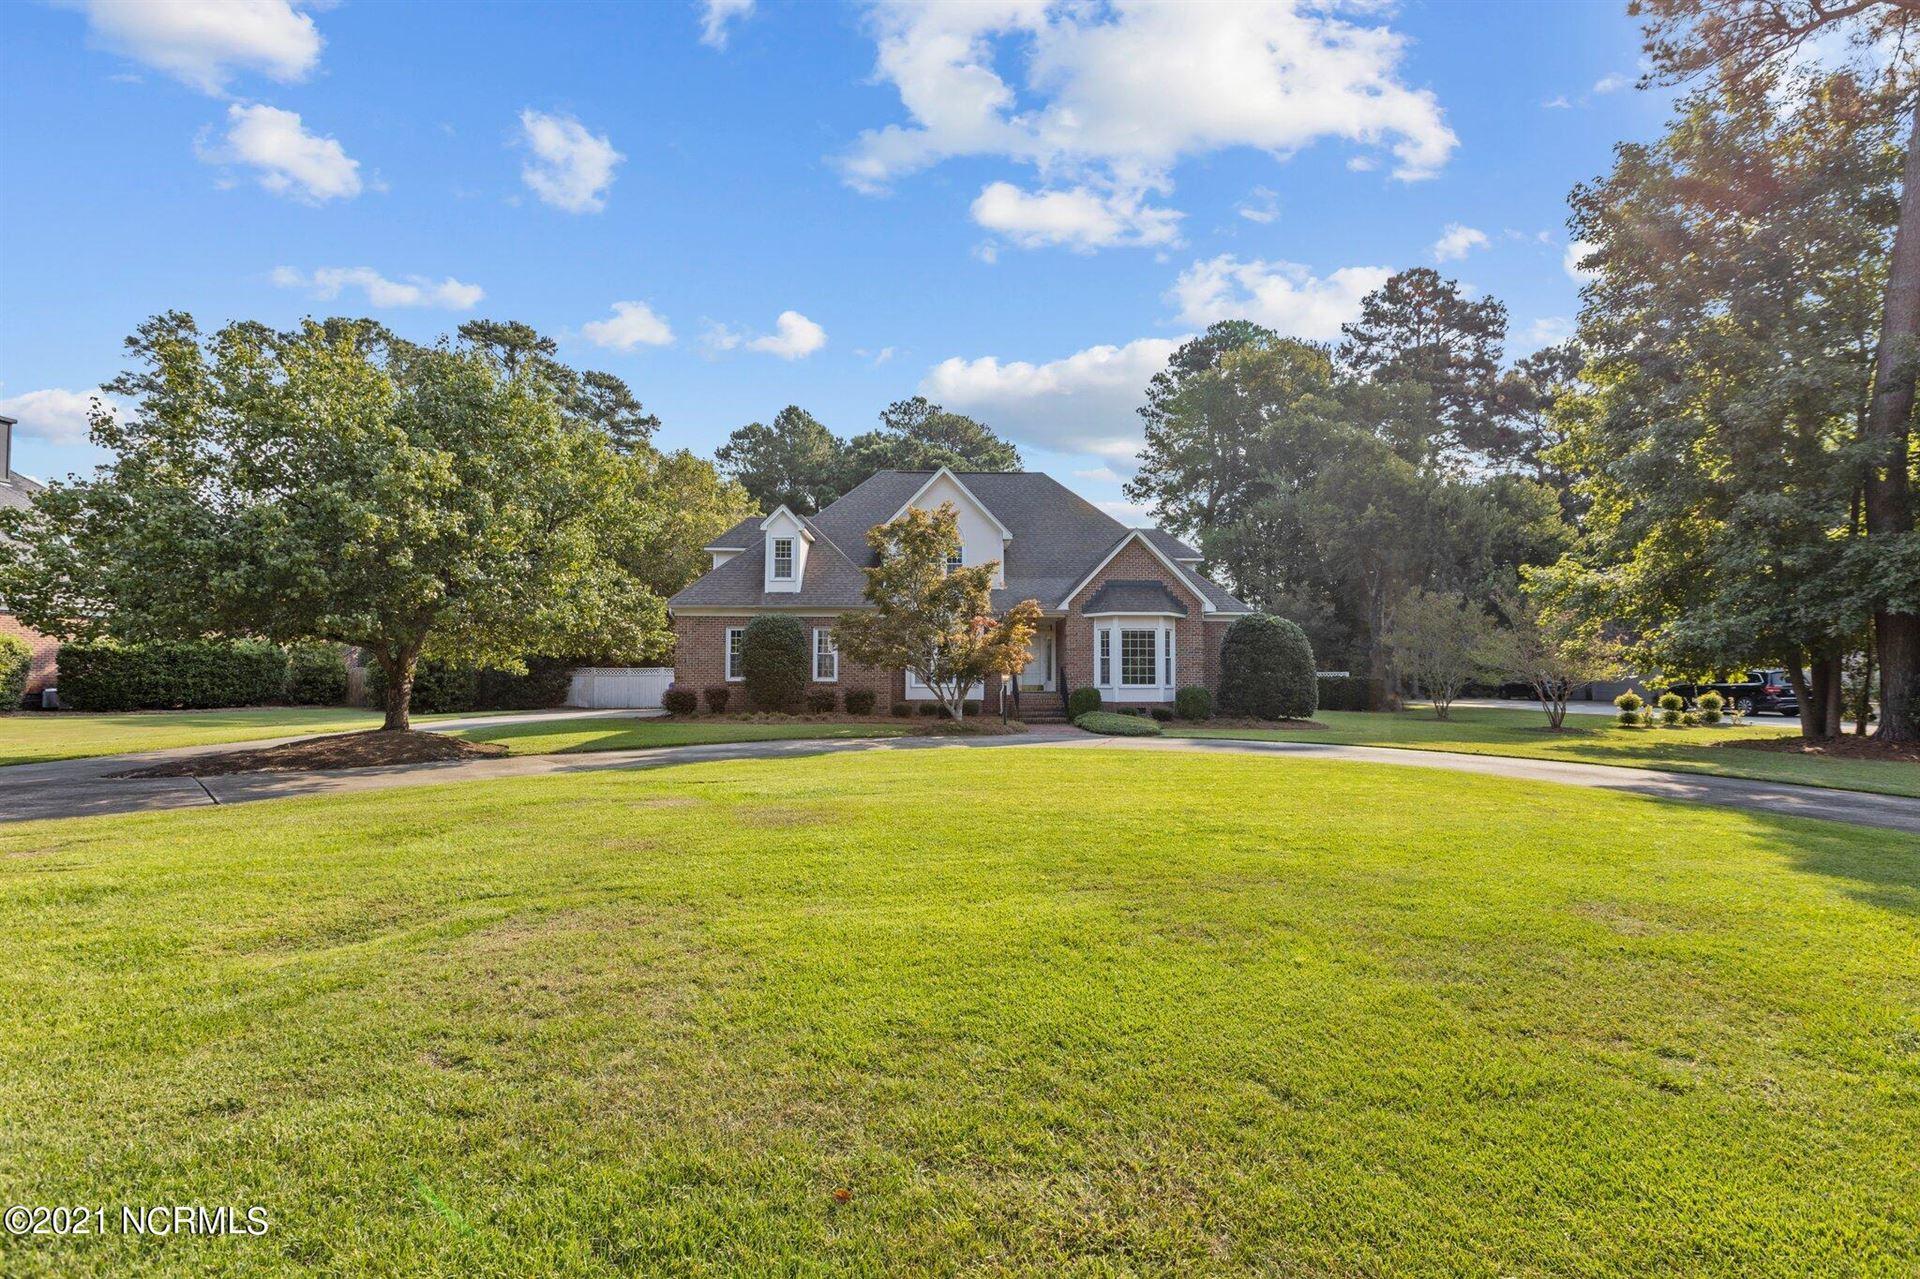 Photo of 3905 Fernwood Lane, Greenville, NC 27834 (MLS # 100283607)